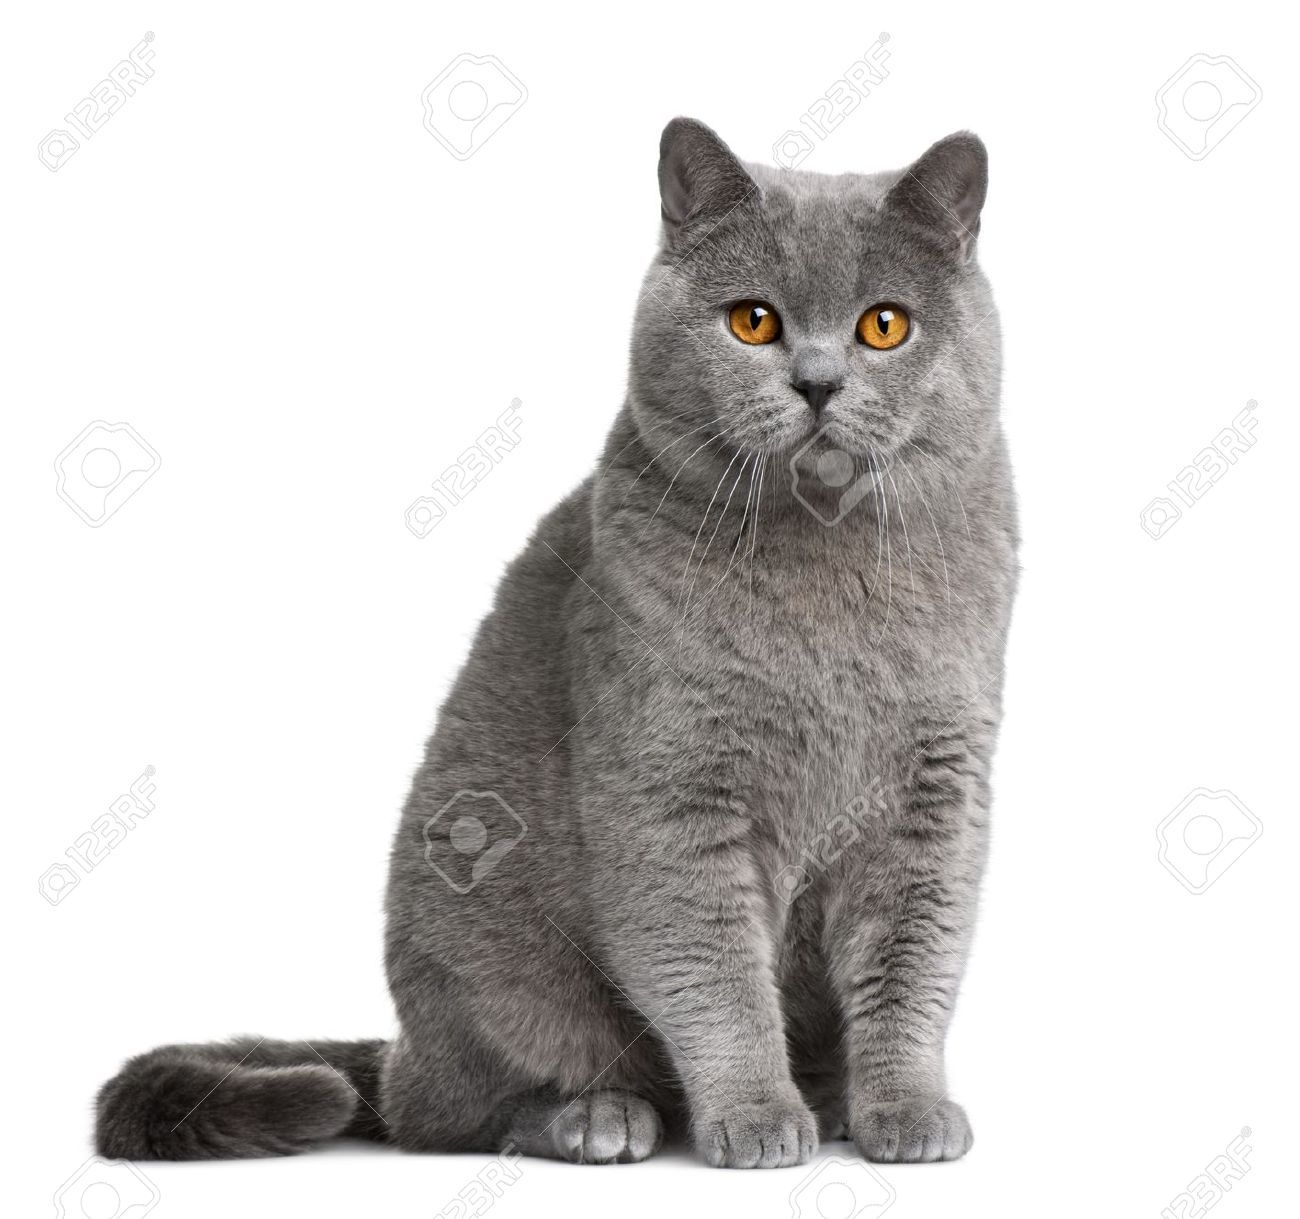 British Shorthair Stock Photos Pictures Royalty Free British Shorthair Images And Stock Photography British Shorthair Cats British Shorthair British Blue Cat